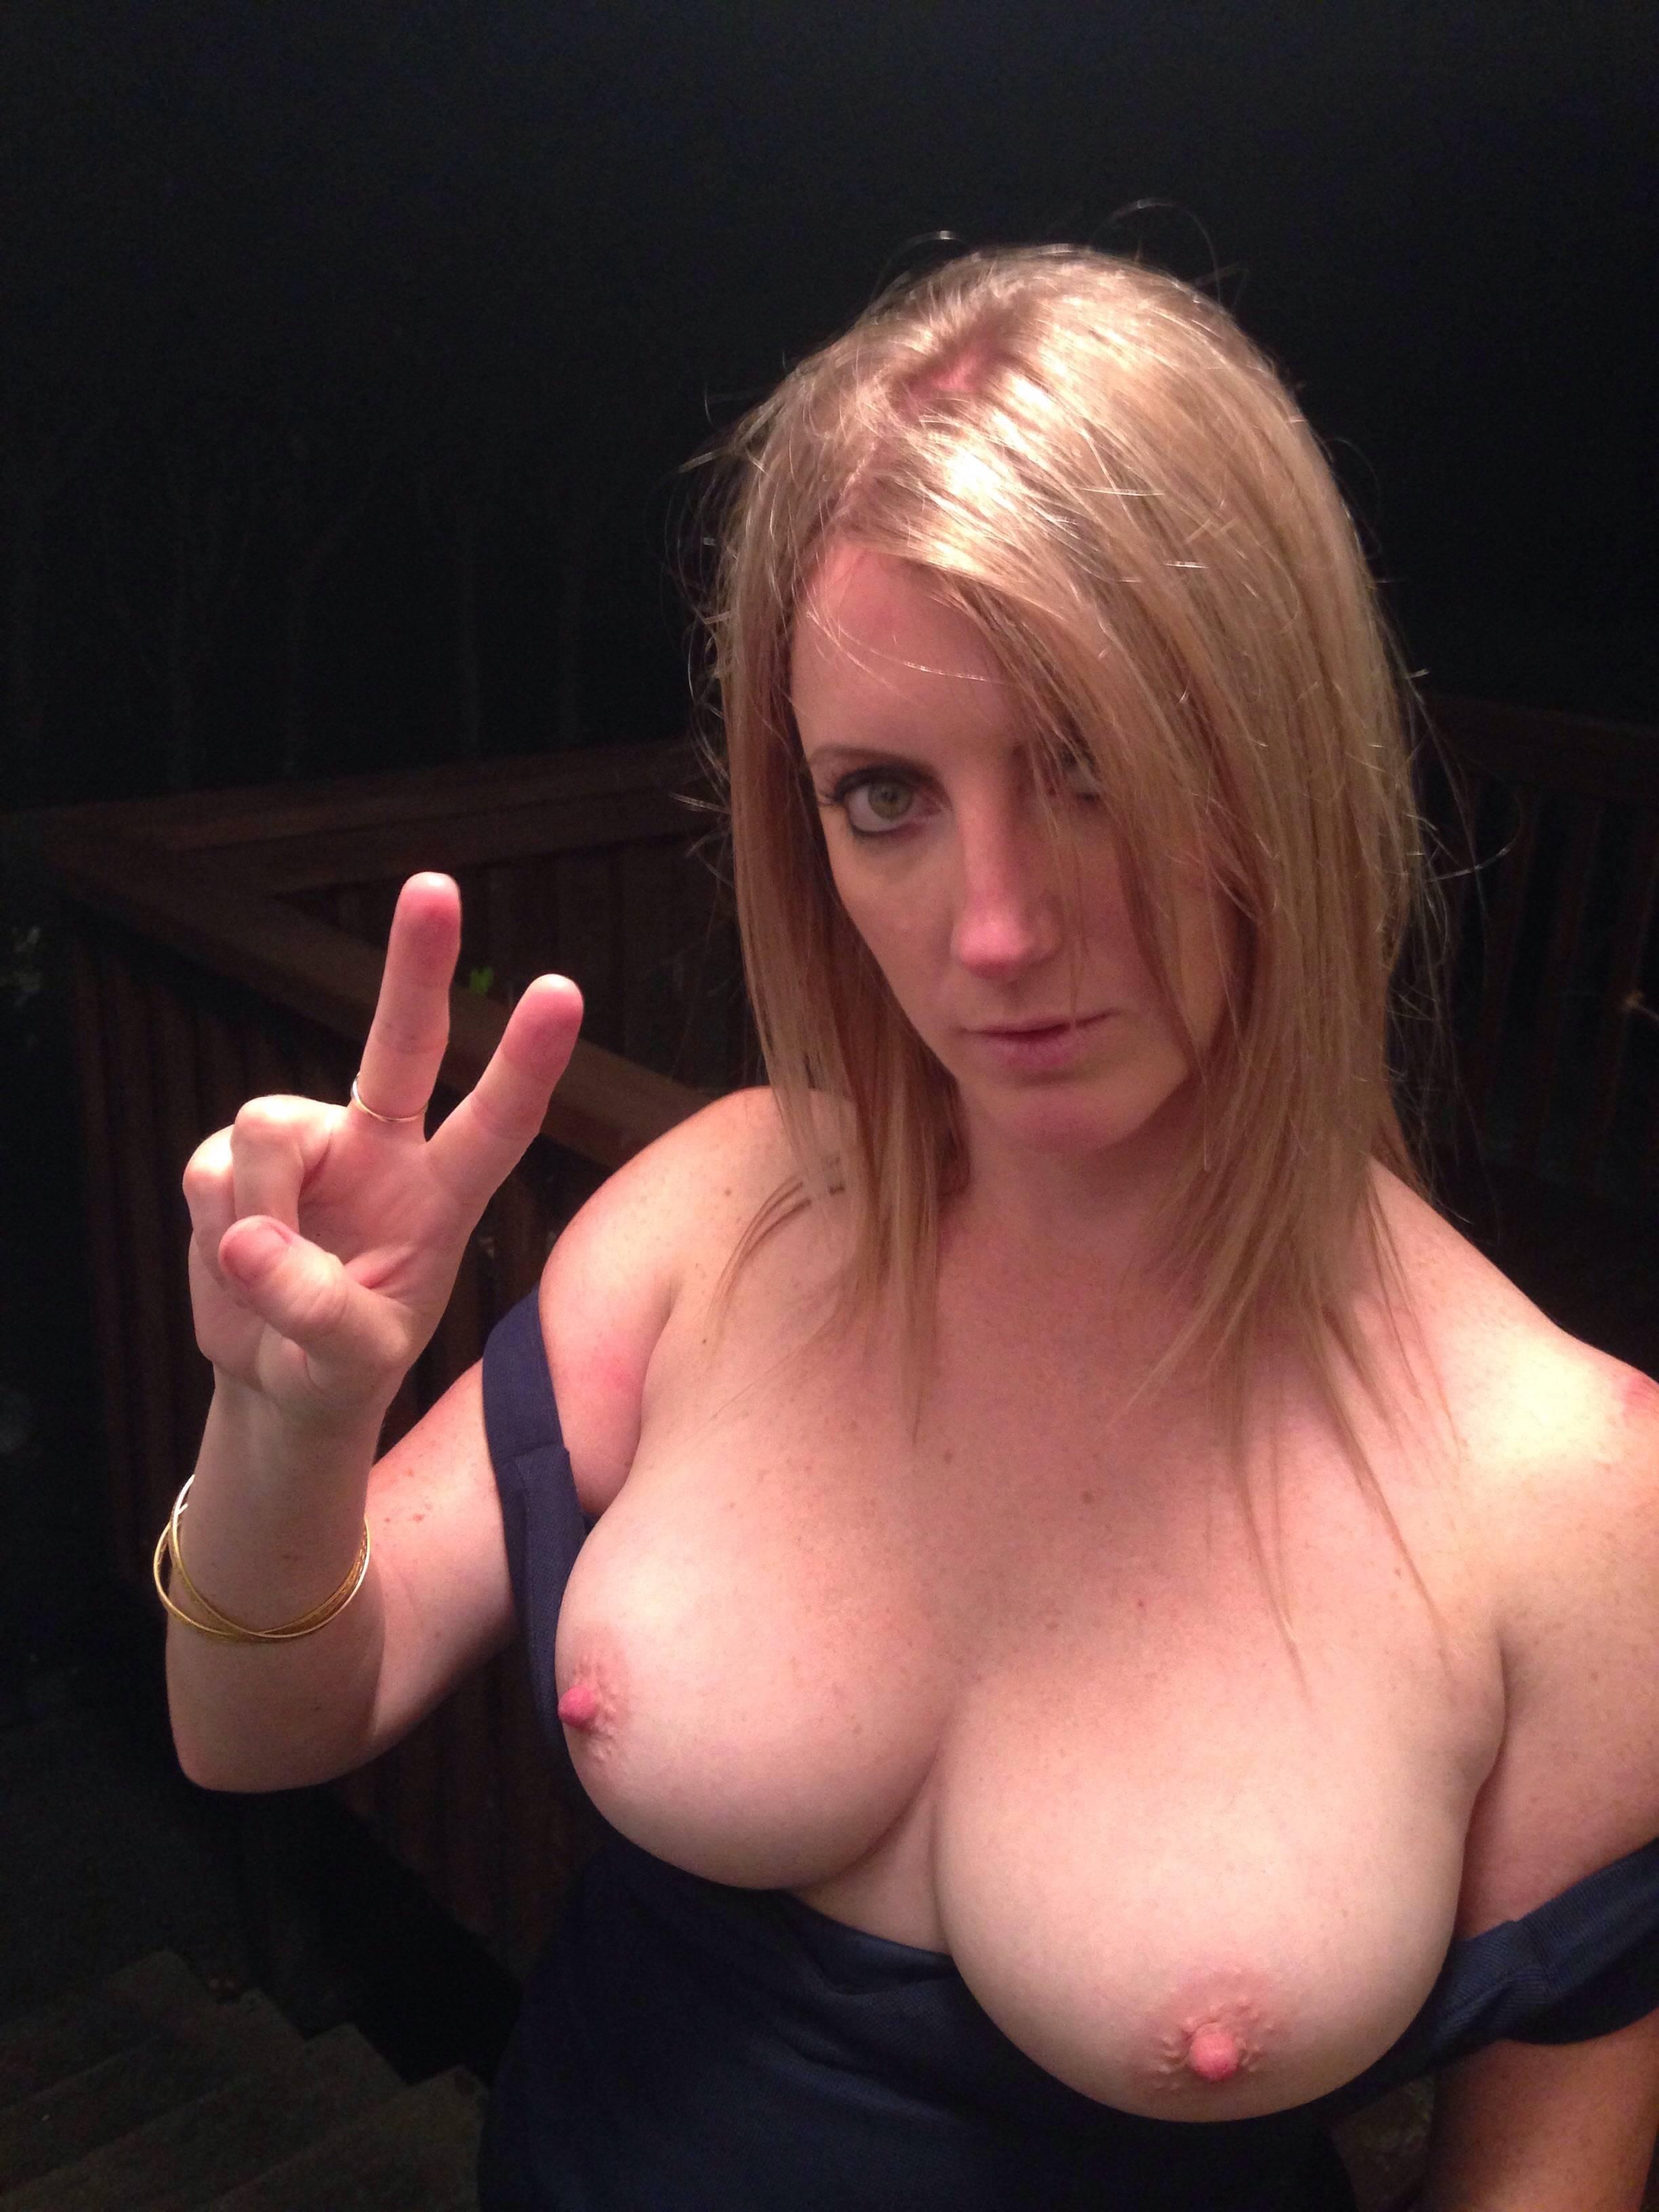 Free online pornstar videos